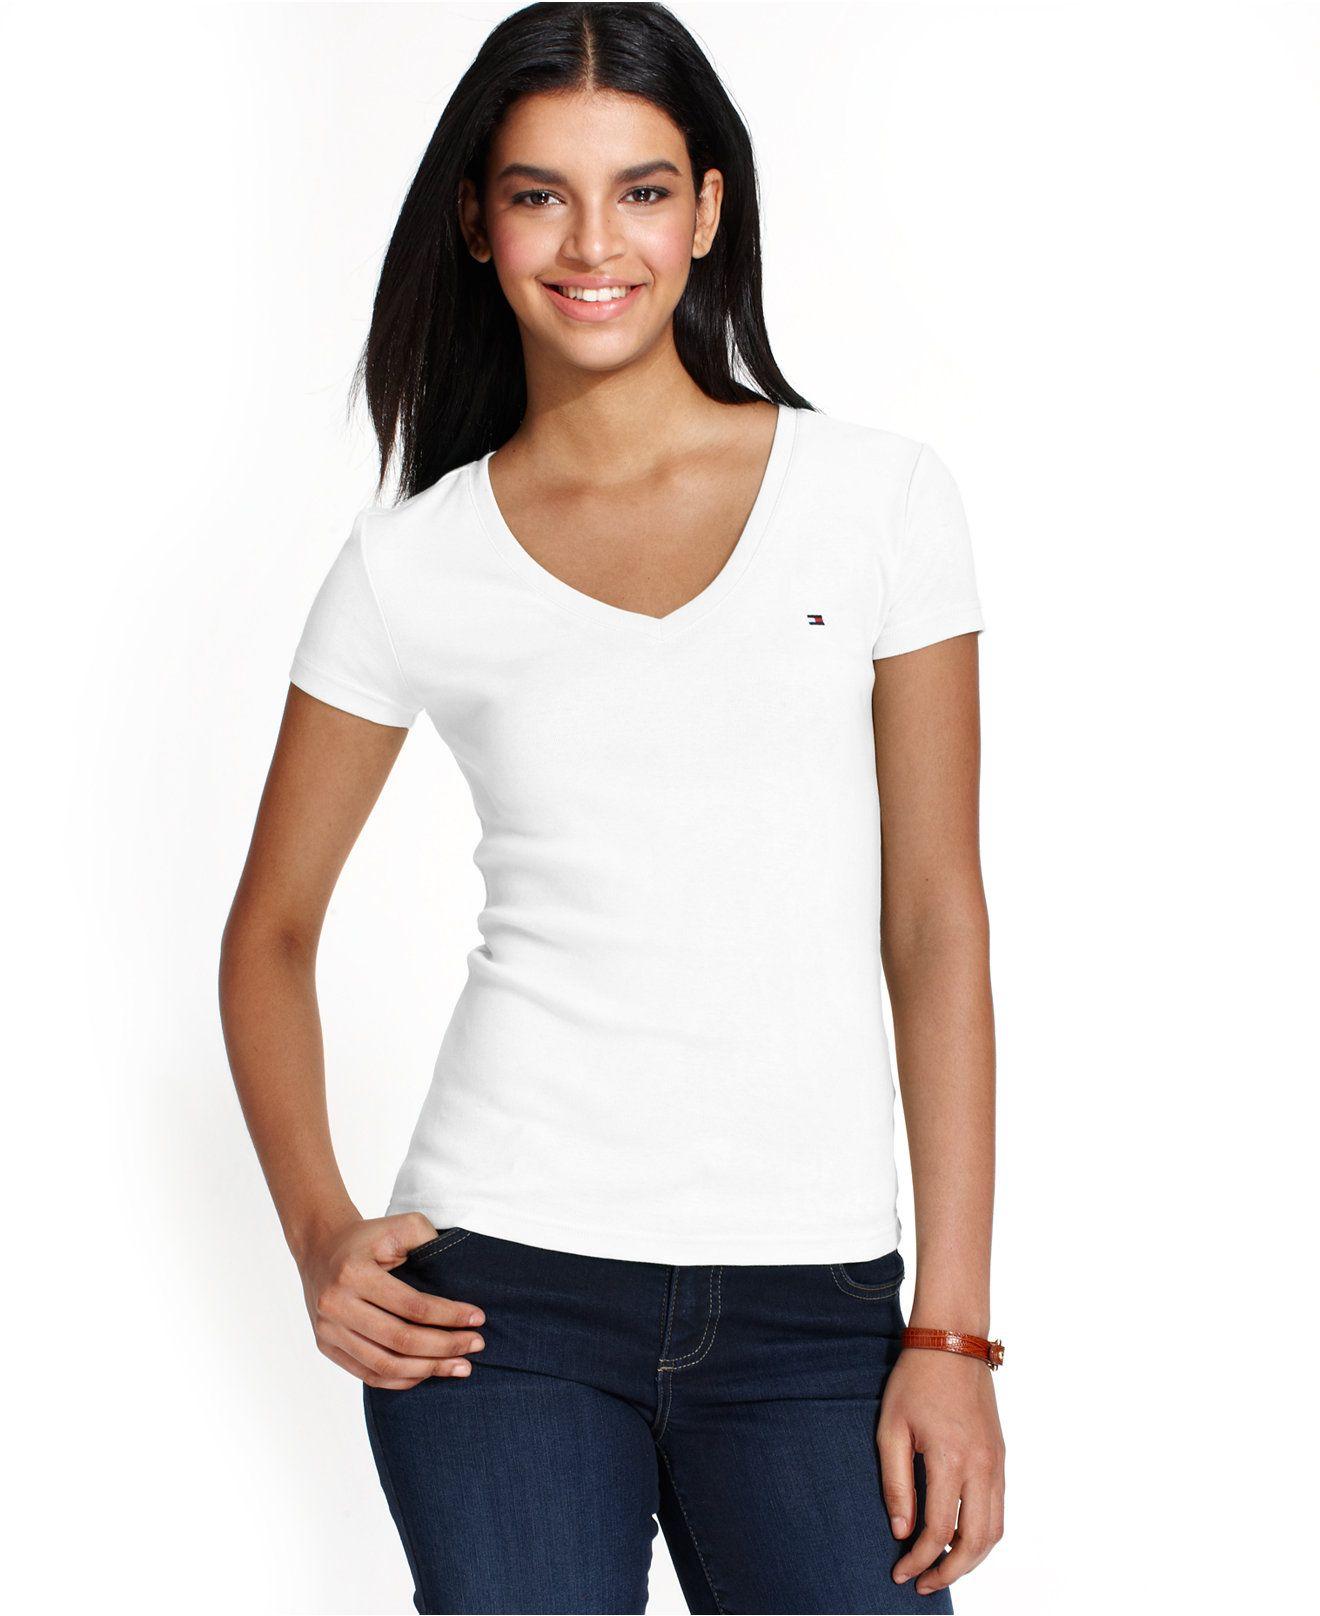 Tommy Hilfiger V-Neck T-Shirt - Tops - Women - Macy s e4a9f0f31